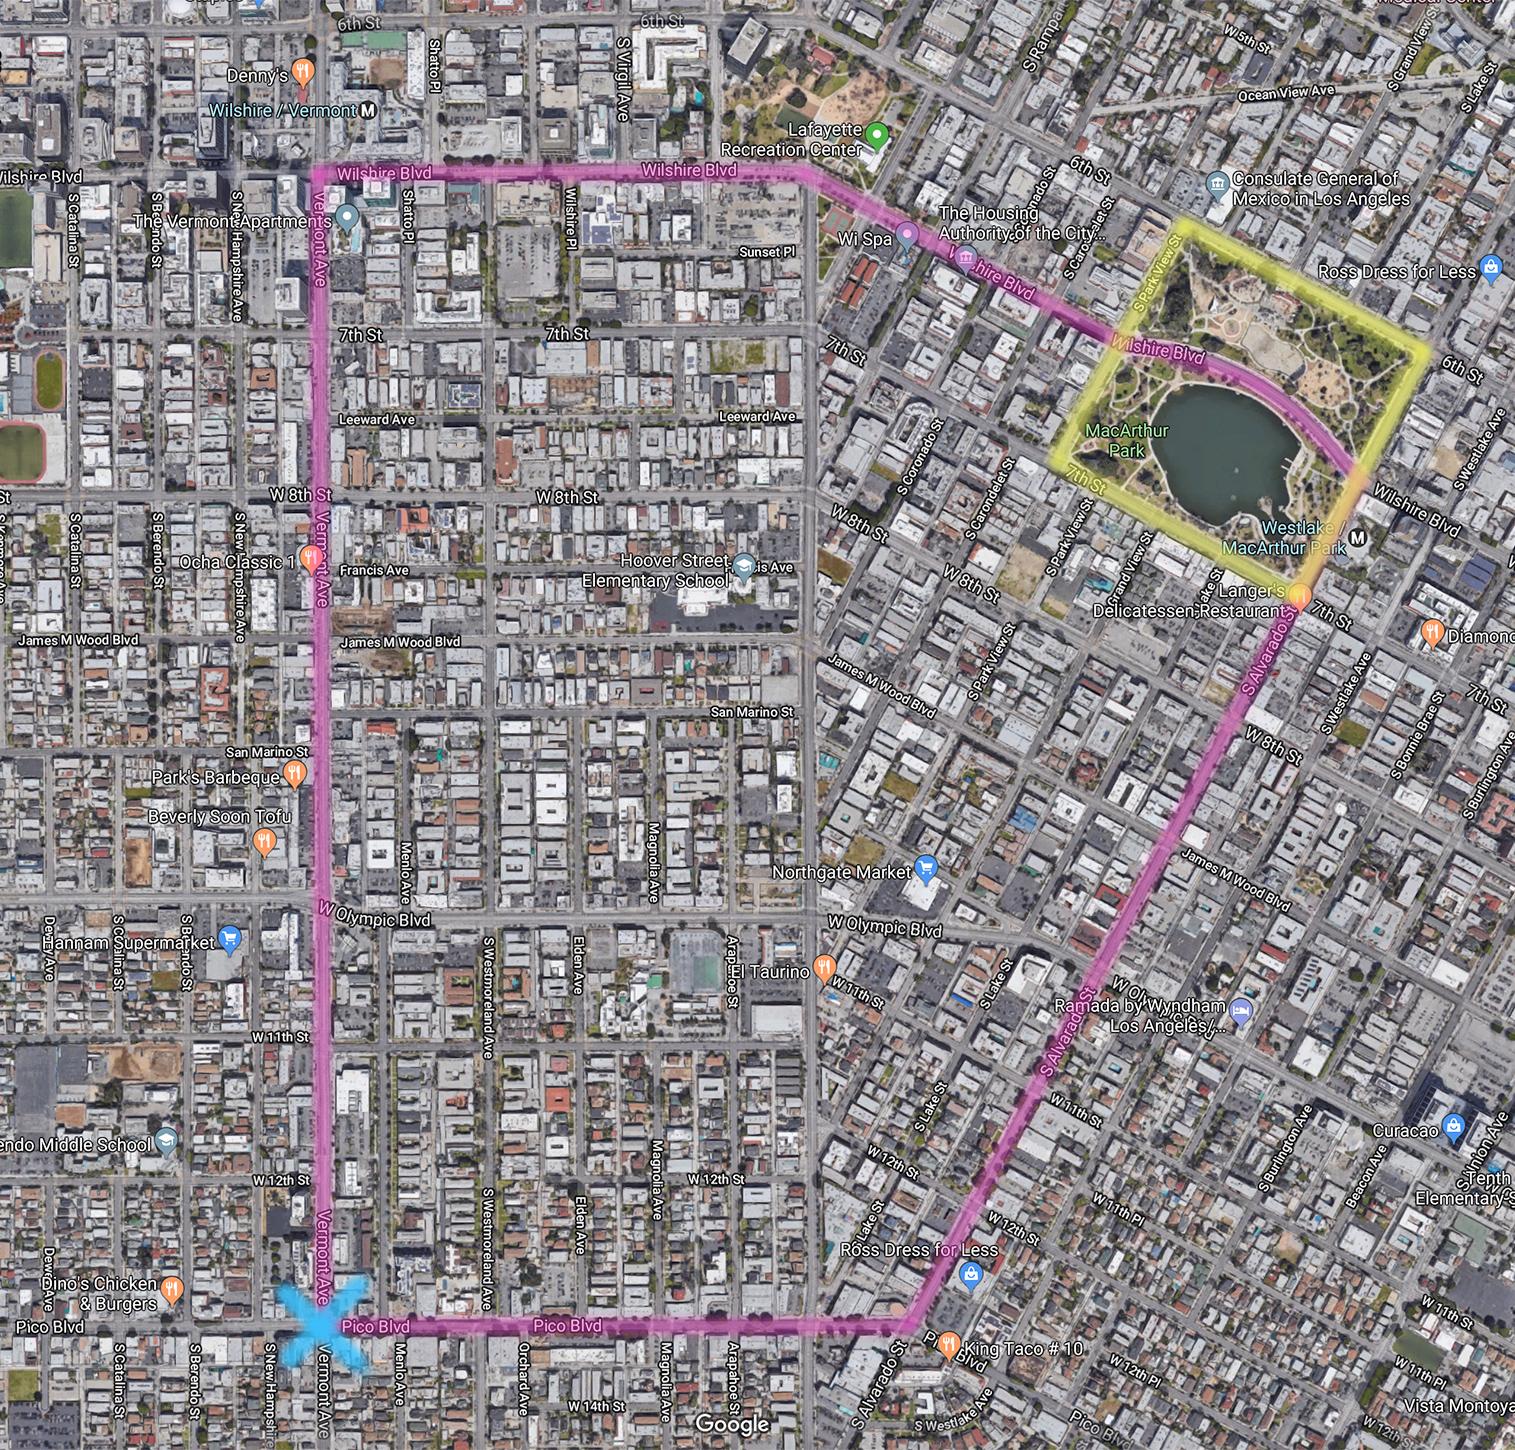 ................. yellow - macarthur park ................. blue - parade start ................. pink - parade route .................